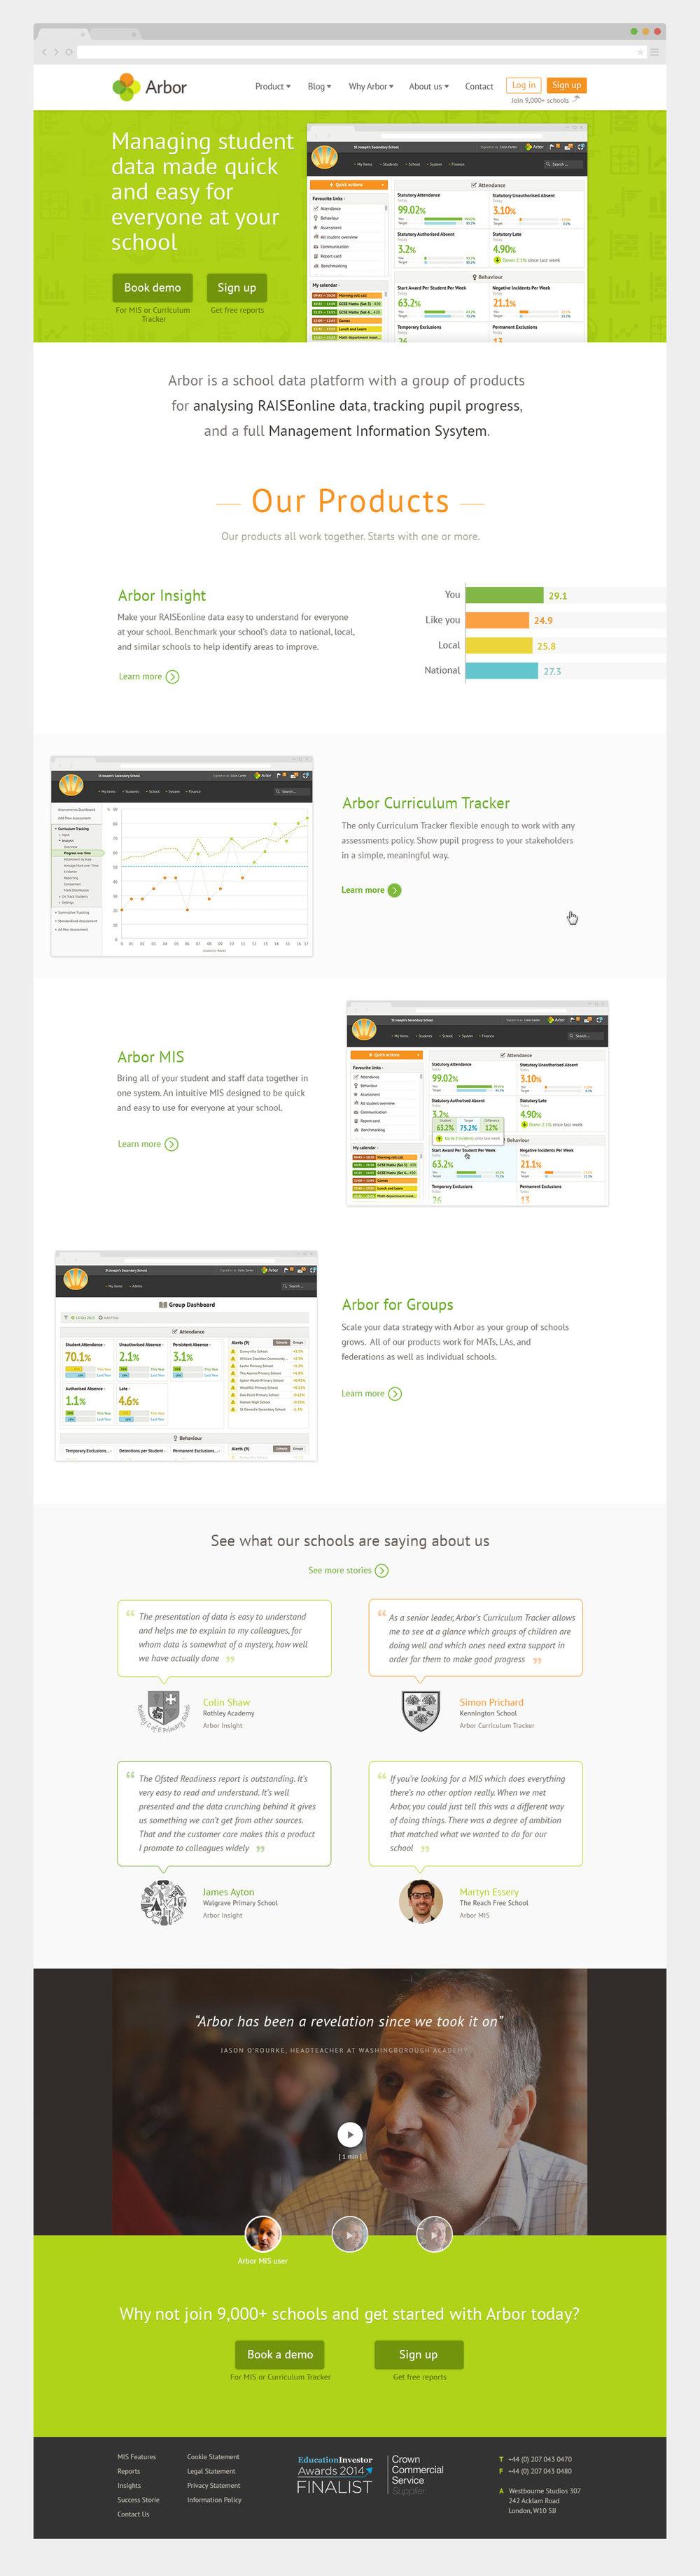 Homepage - http://arbor-education.com/